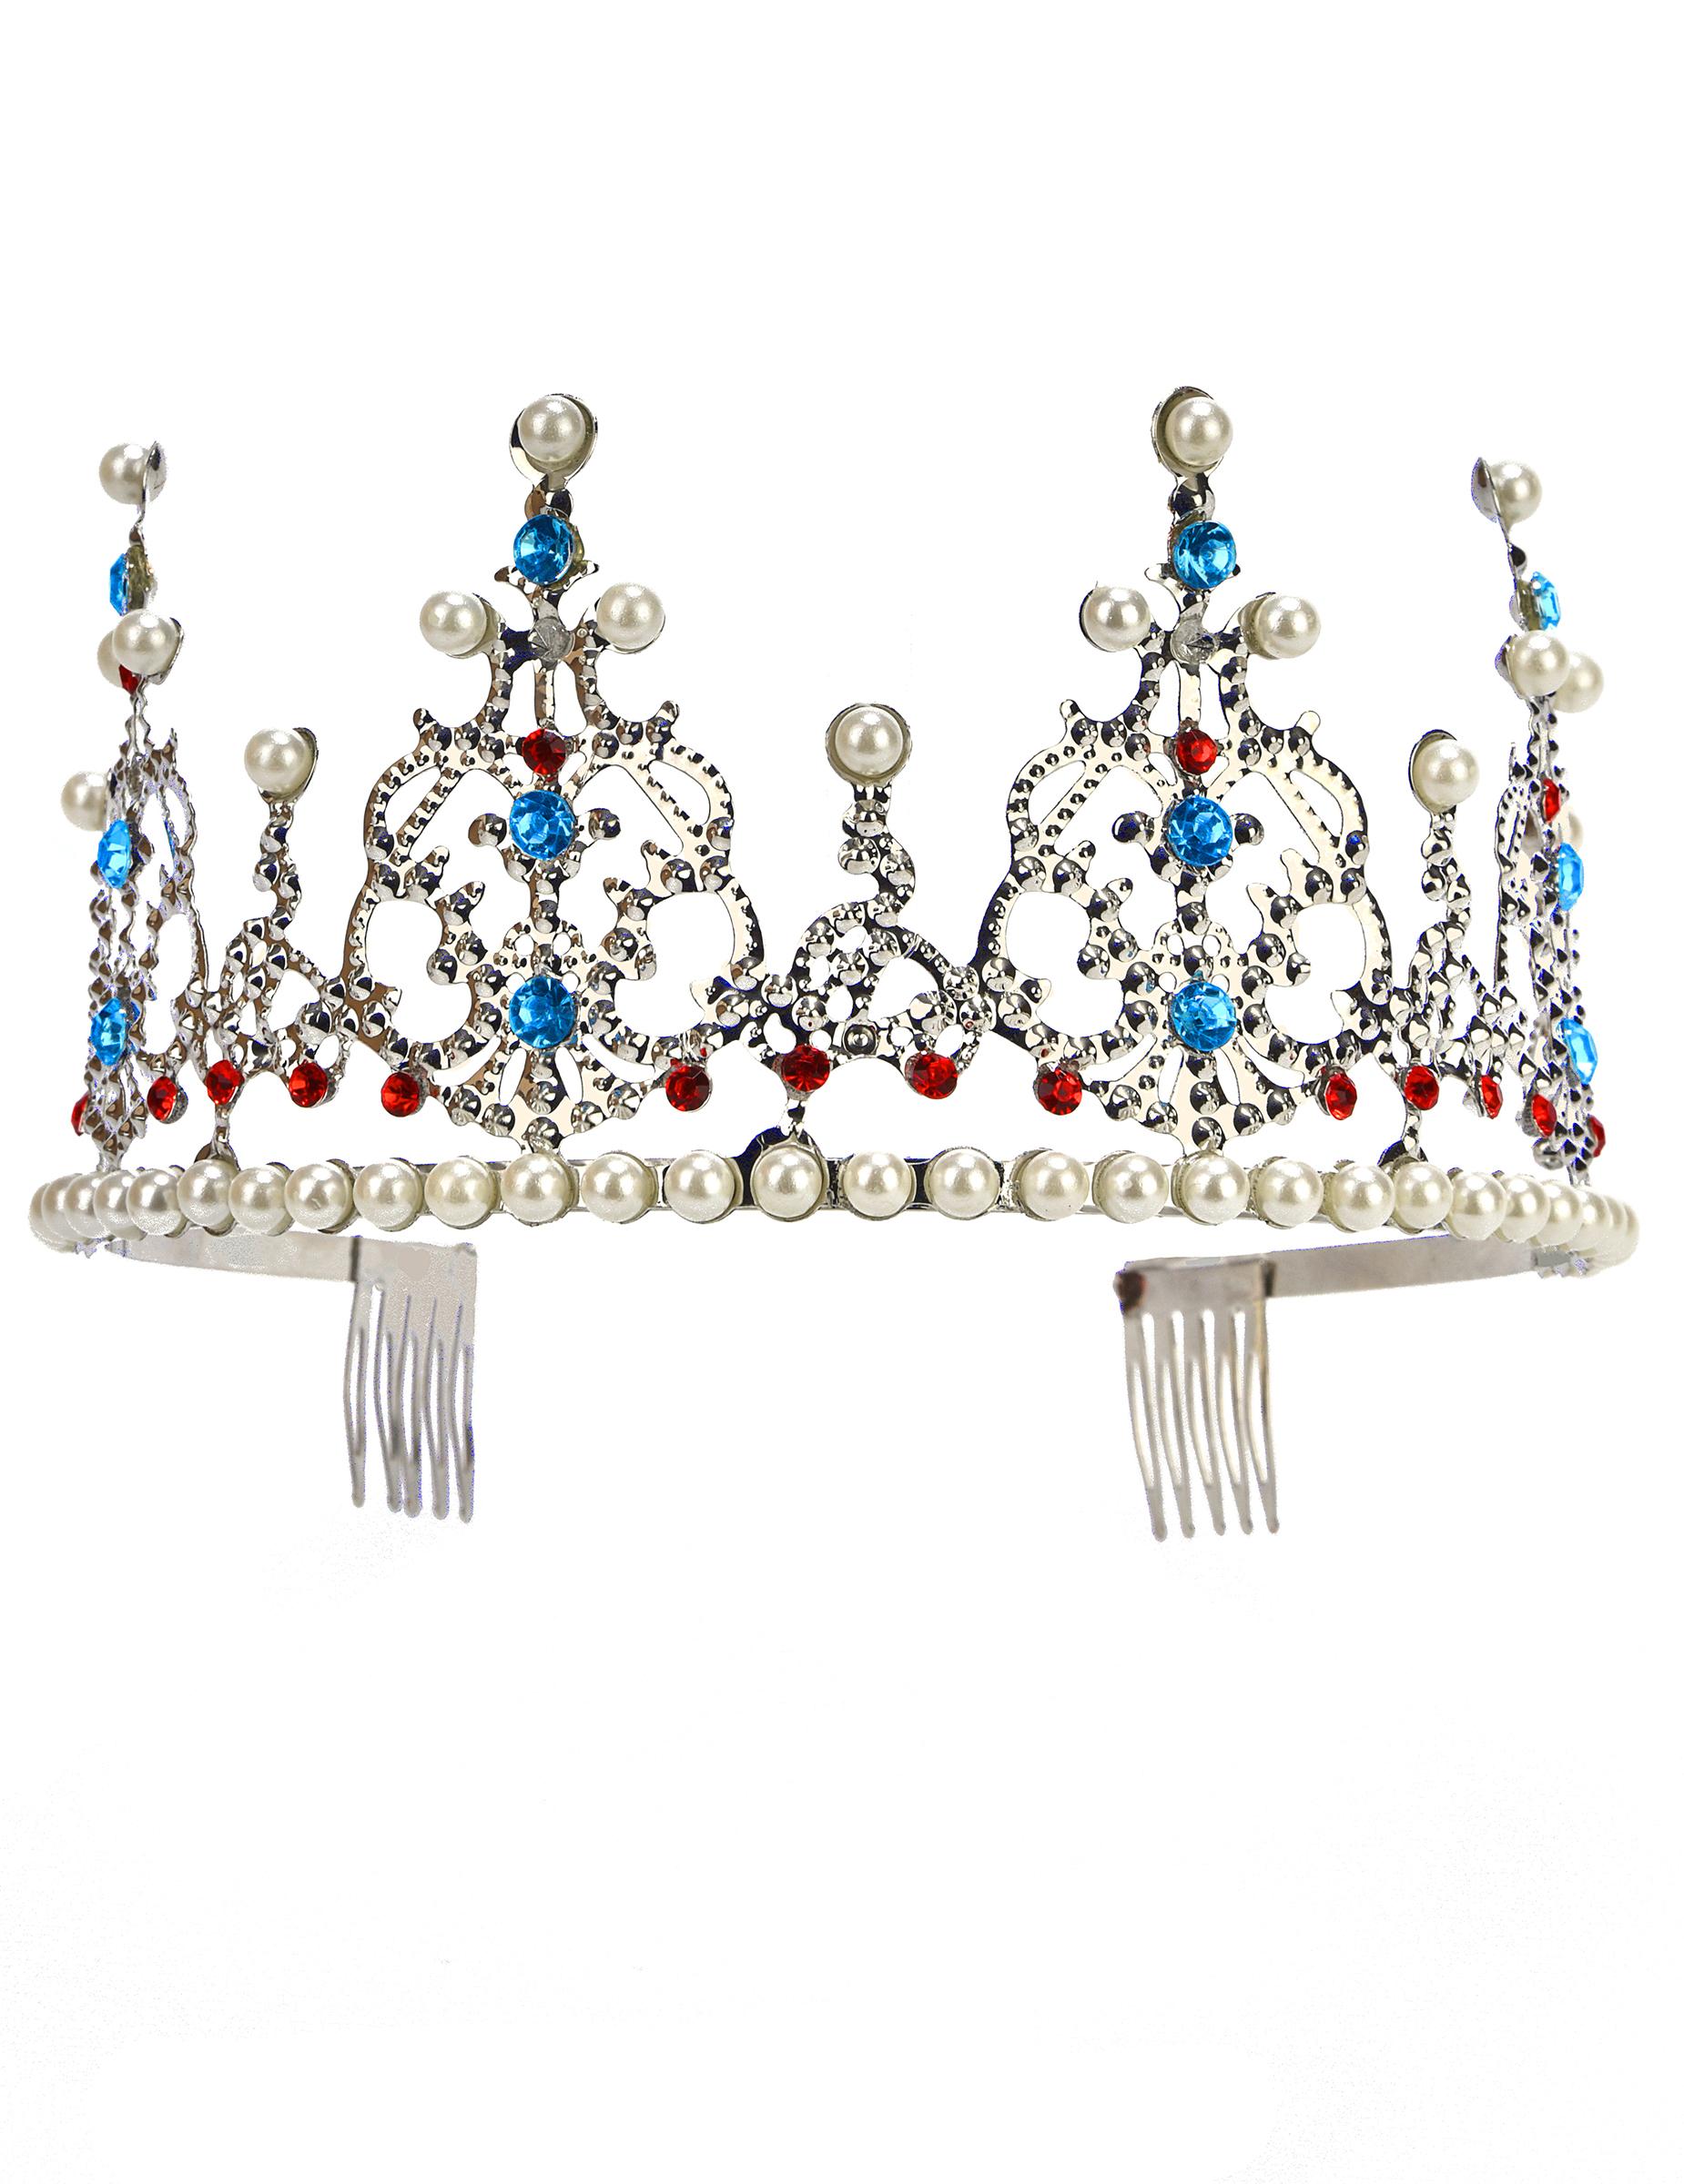 Edle prinzessinnen tiara silber g nstige faschings for Edle accessoires